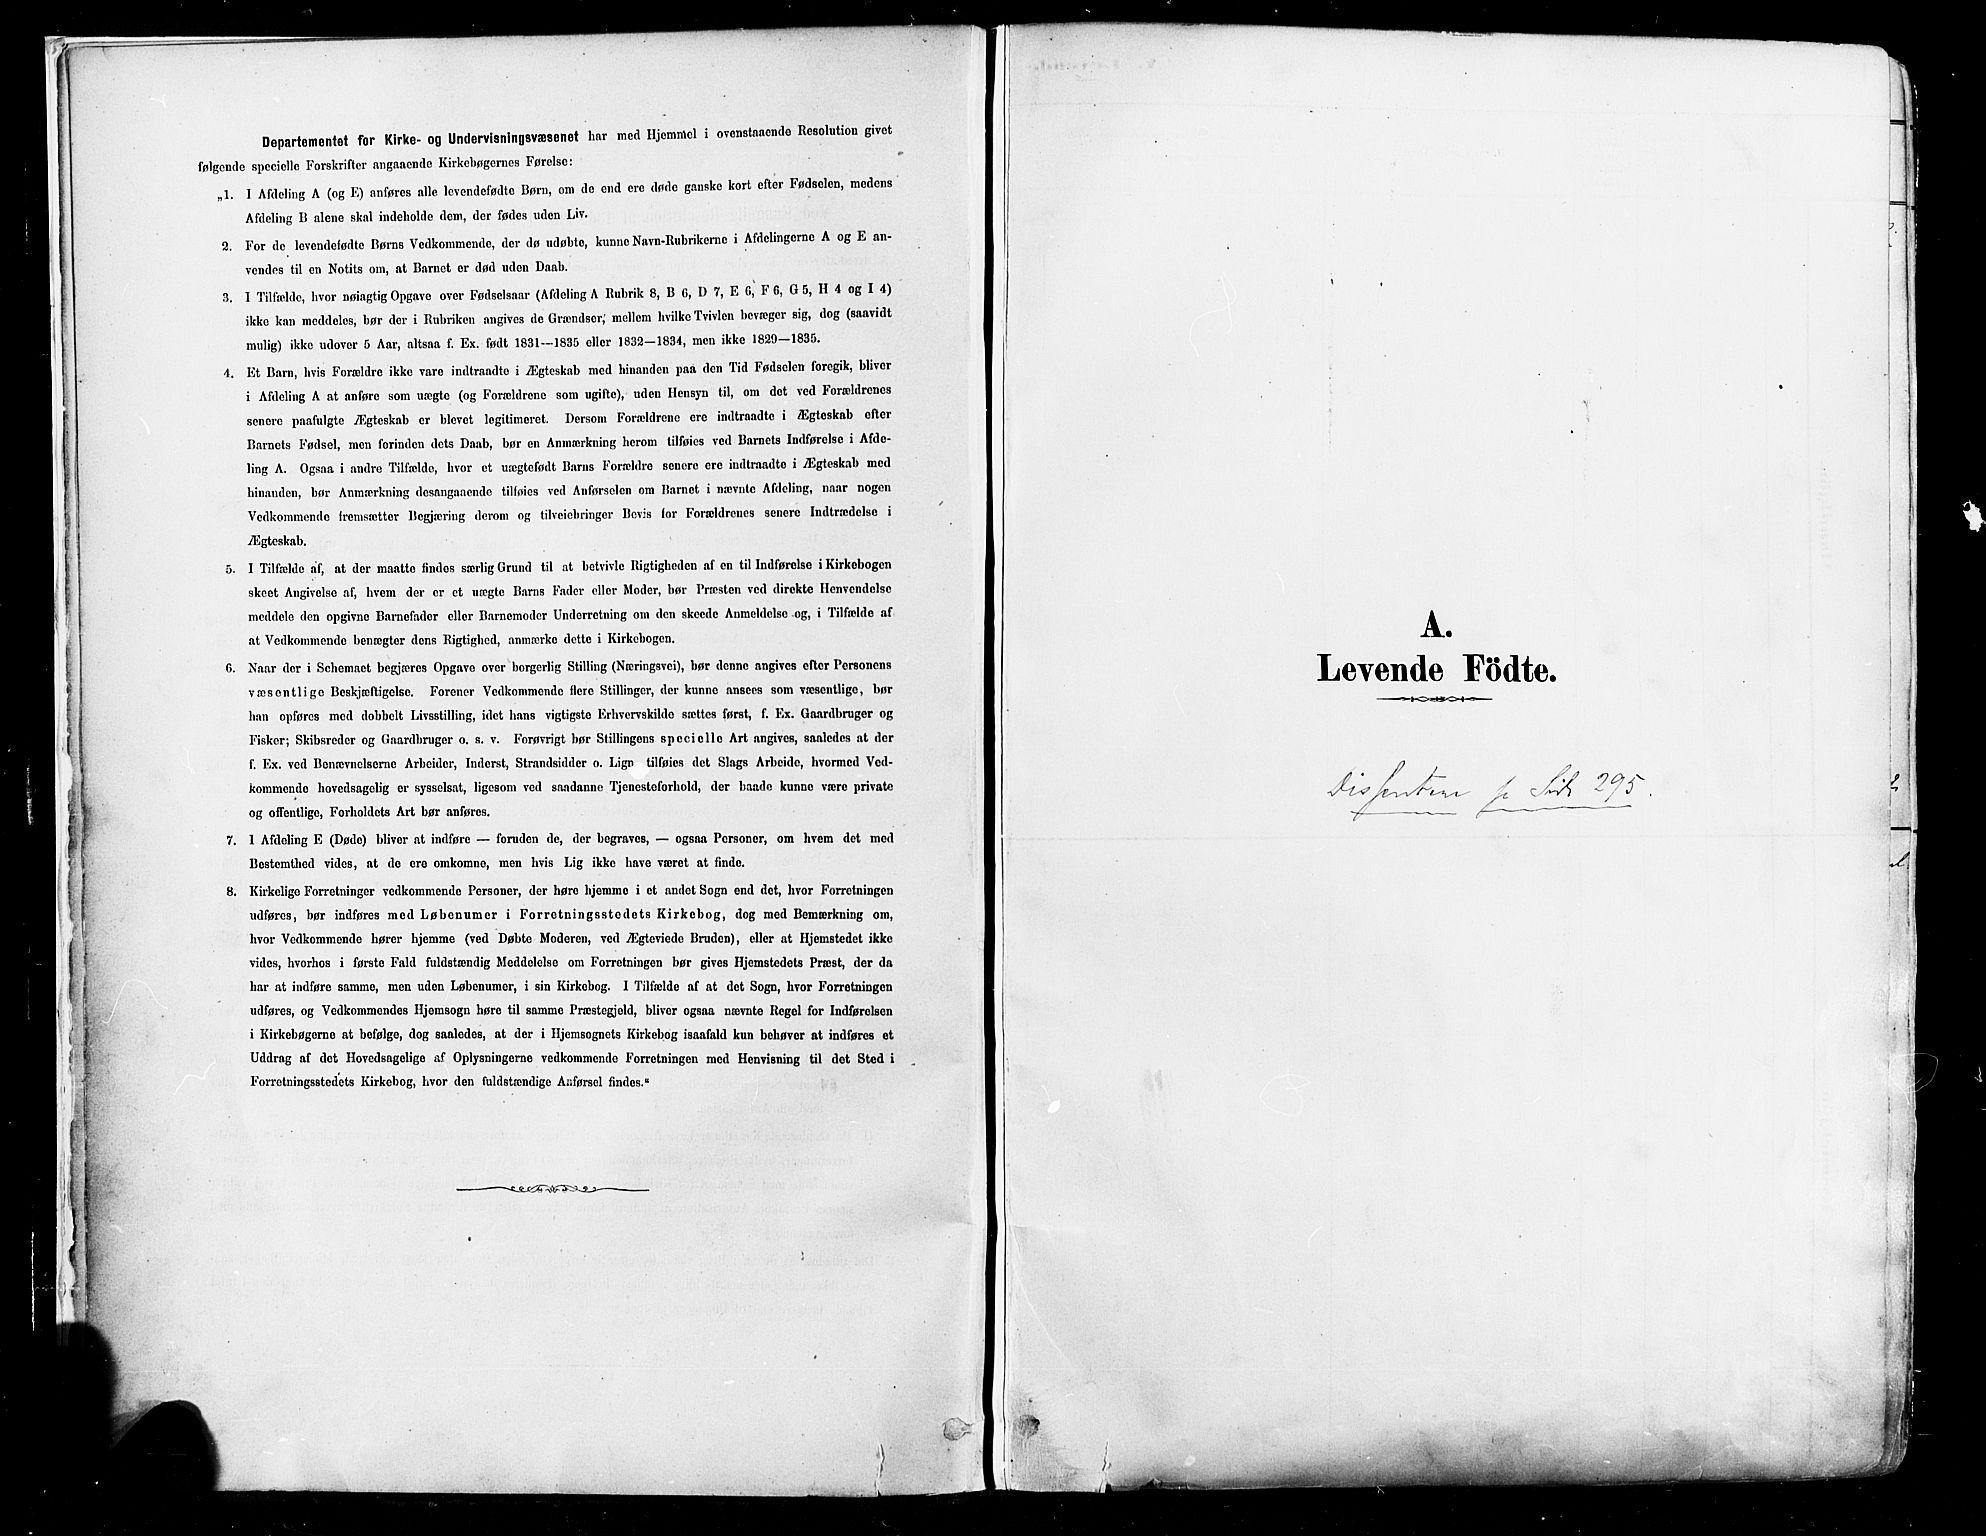 SAO, Johannes prestekontor Kirkebøker, F/Fa/L0003: Ministerialbok nr. 3, 1882-1896